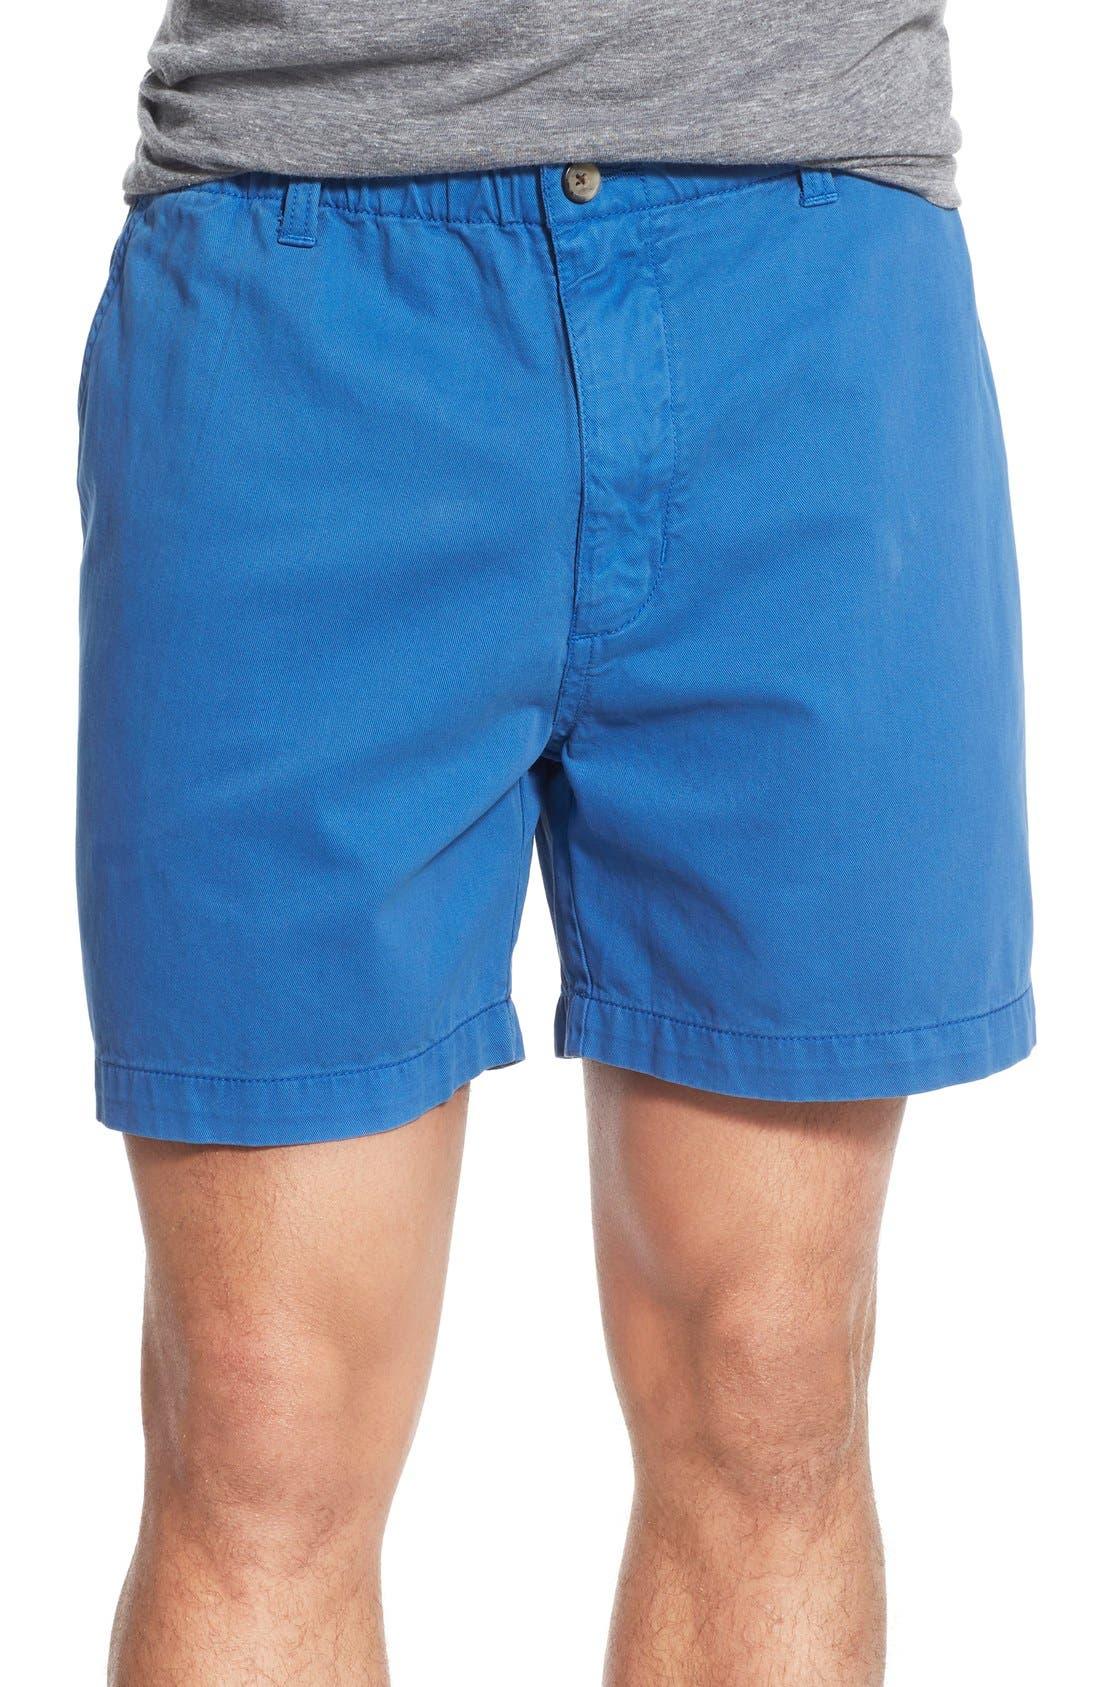 Main Image - Vintage 1946 'Snappers' Vintage Washed Elastic Waistband Shorts